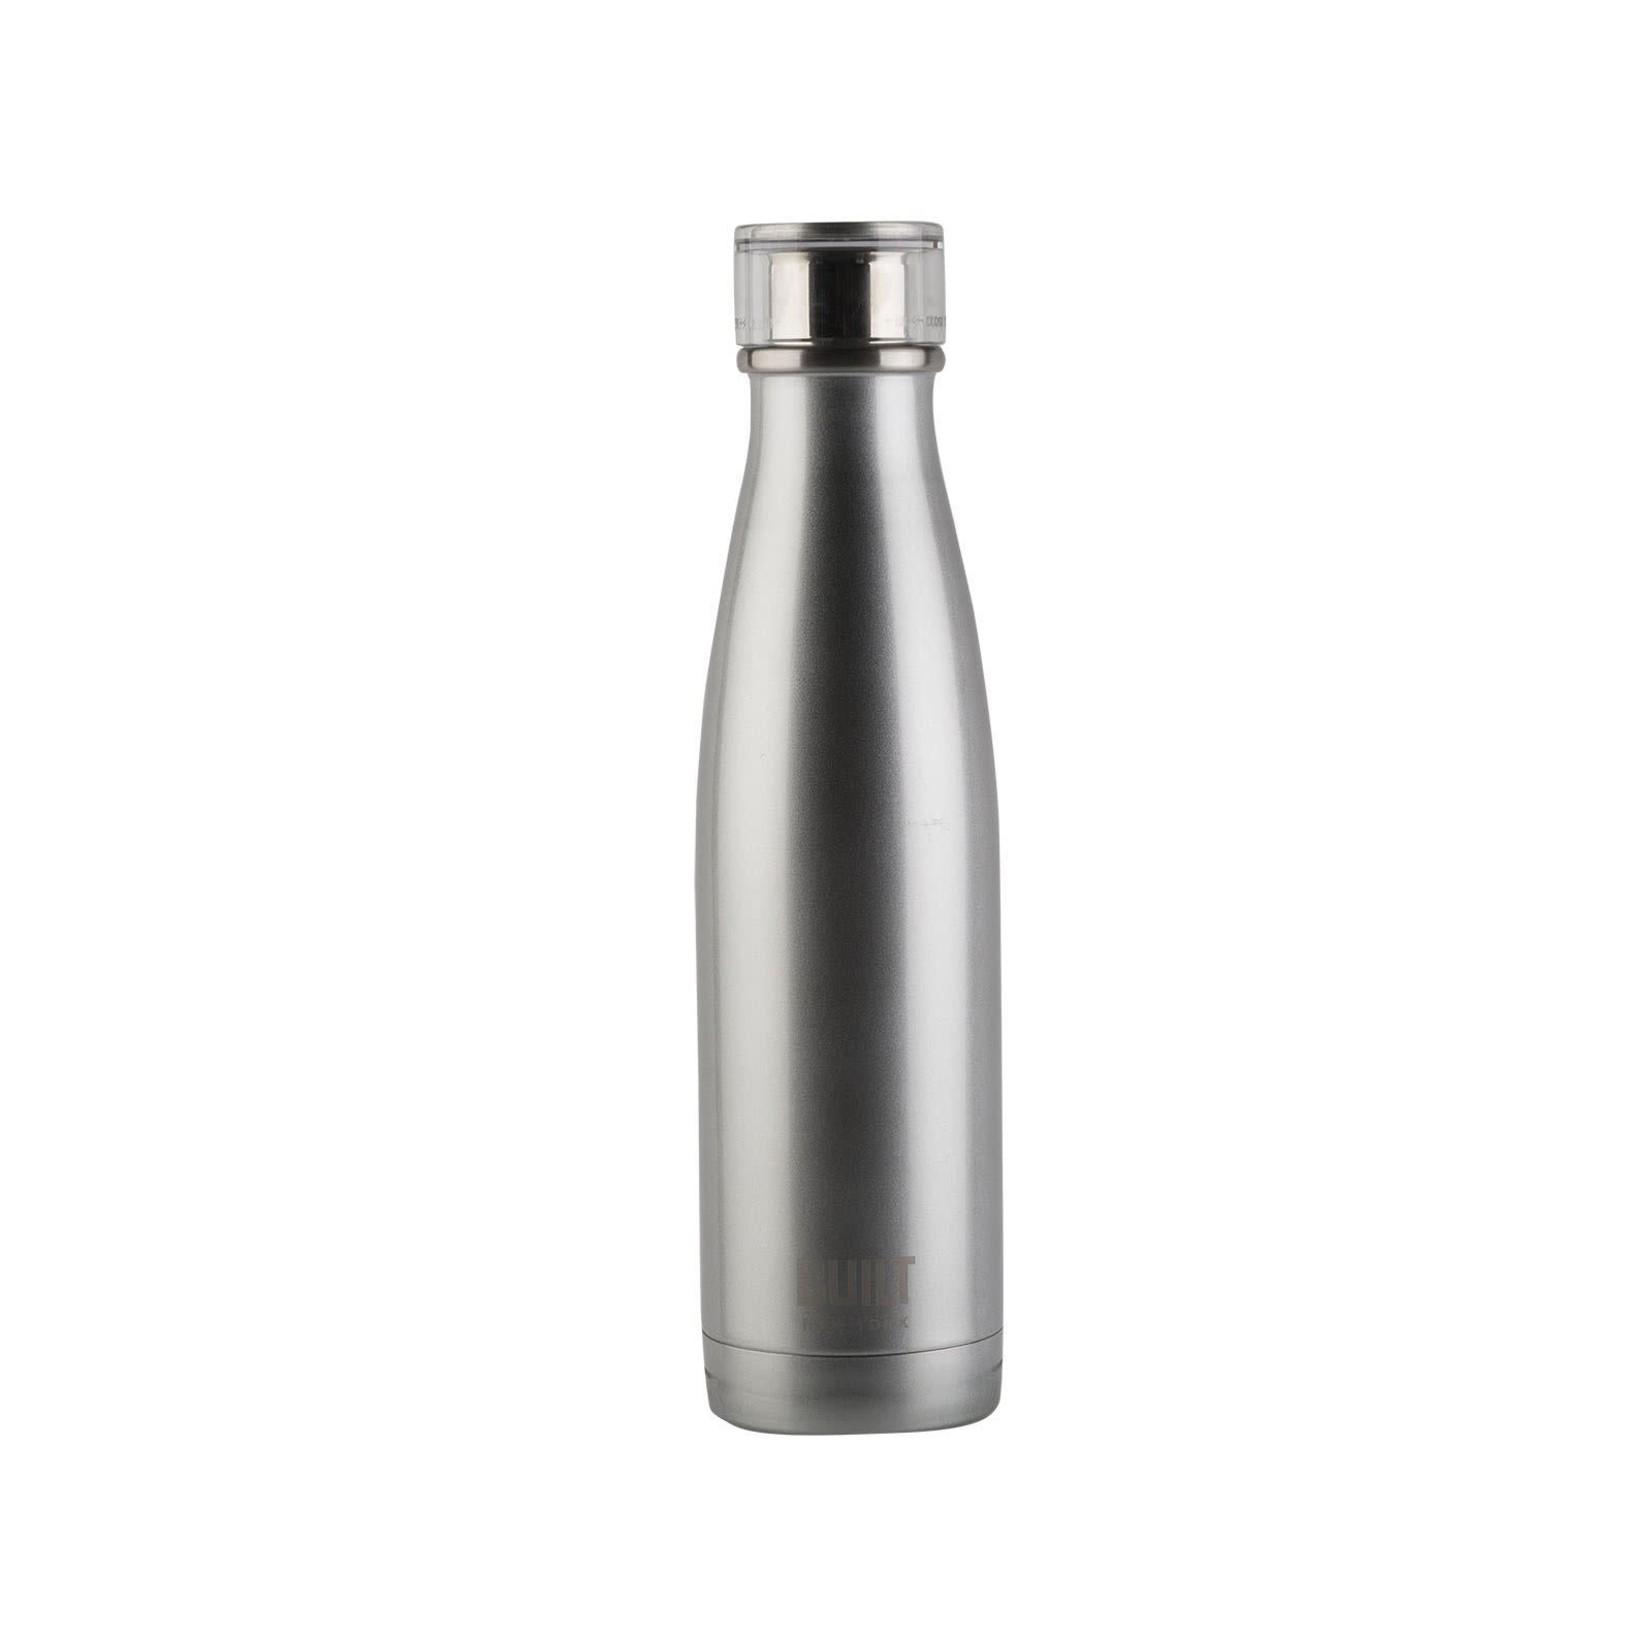 Built Isolerende lekvrije drinkfles 0,5L RVS zilver